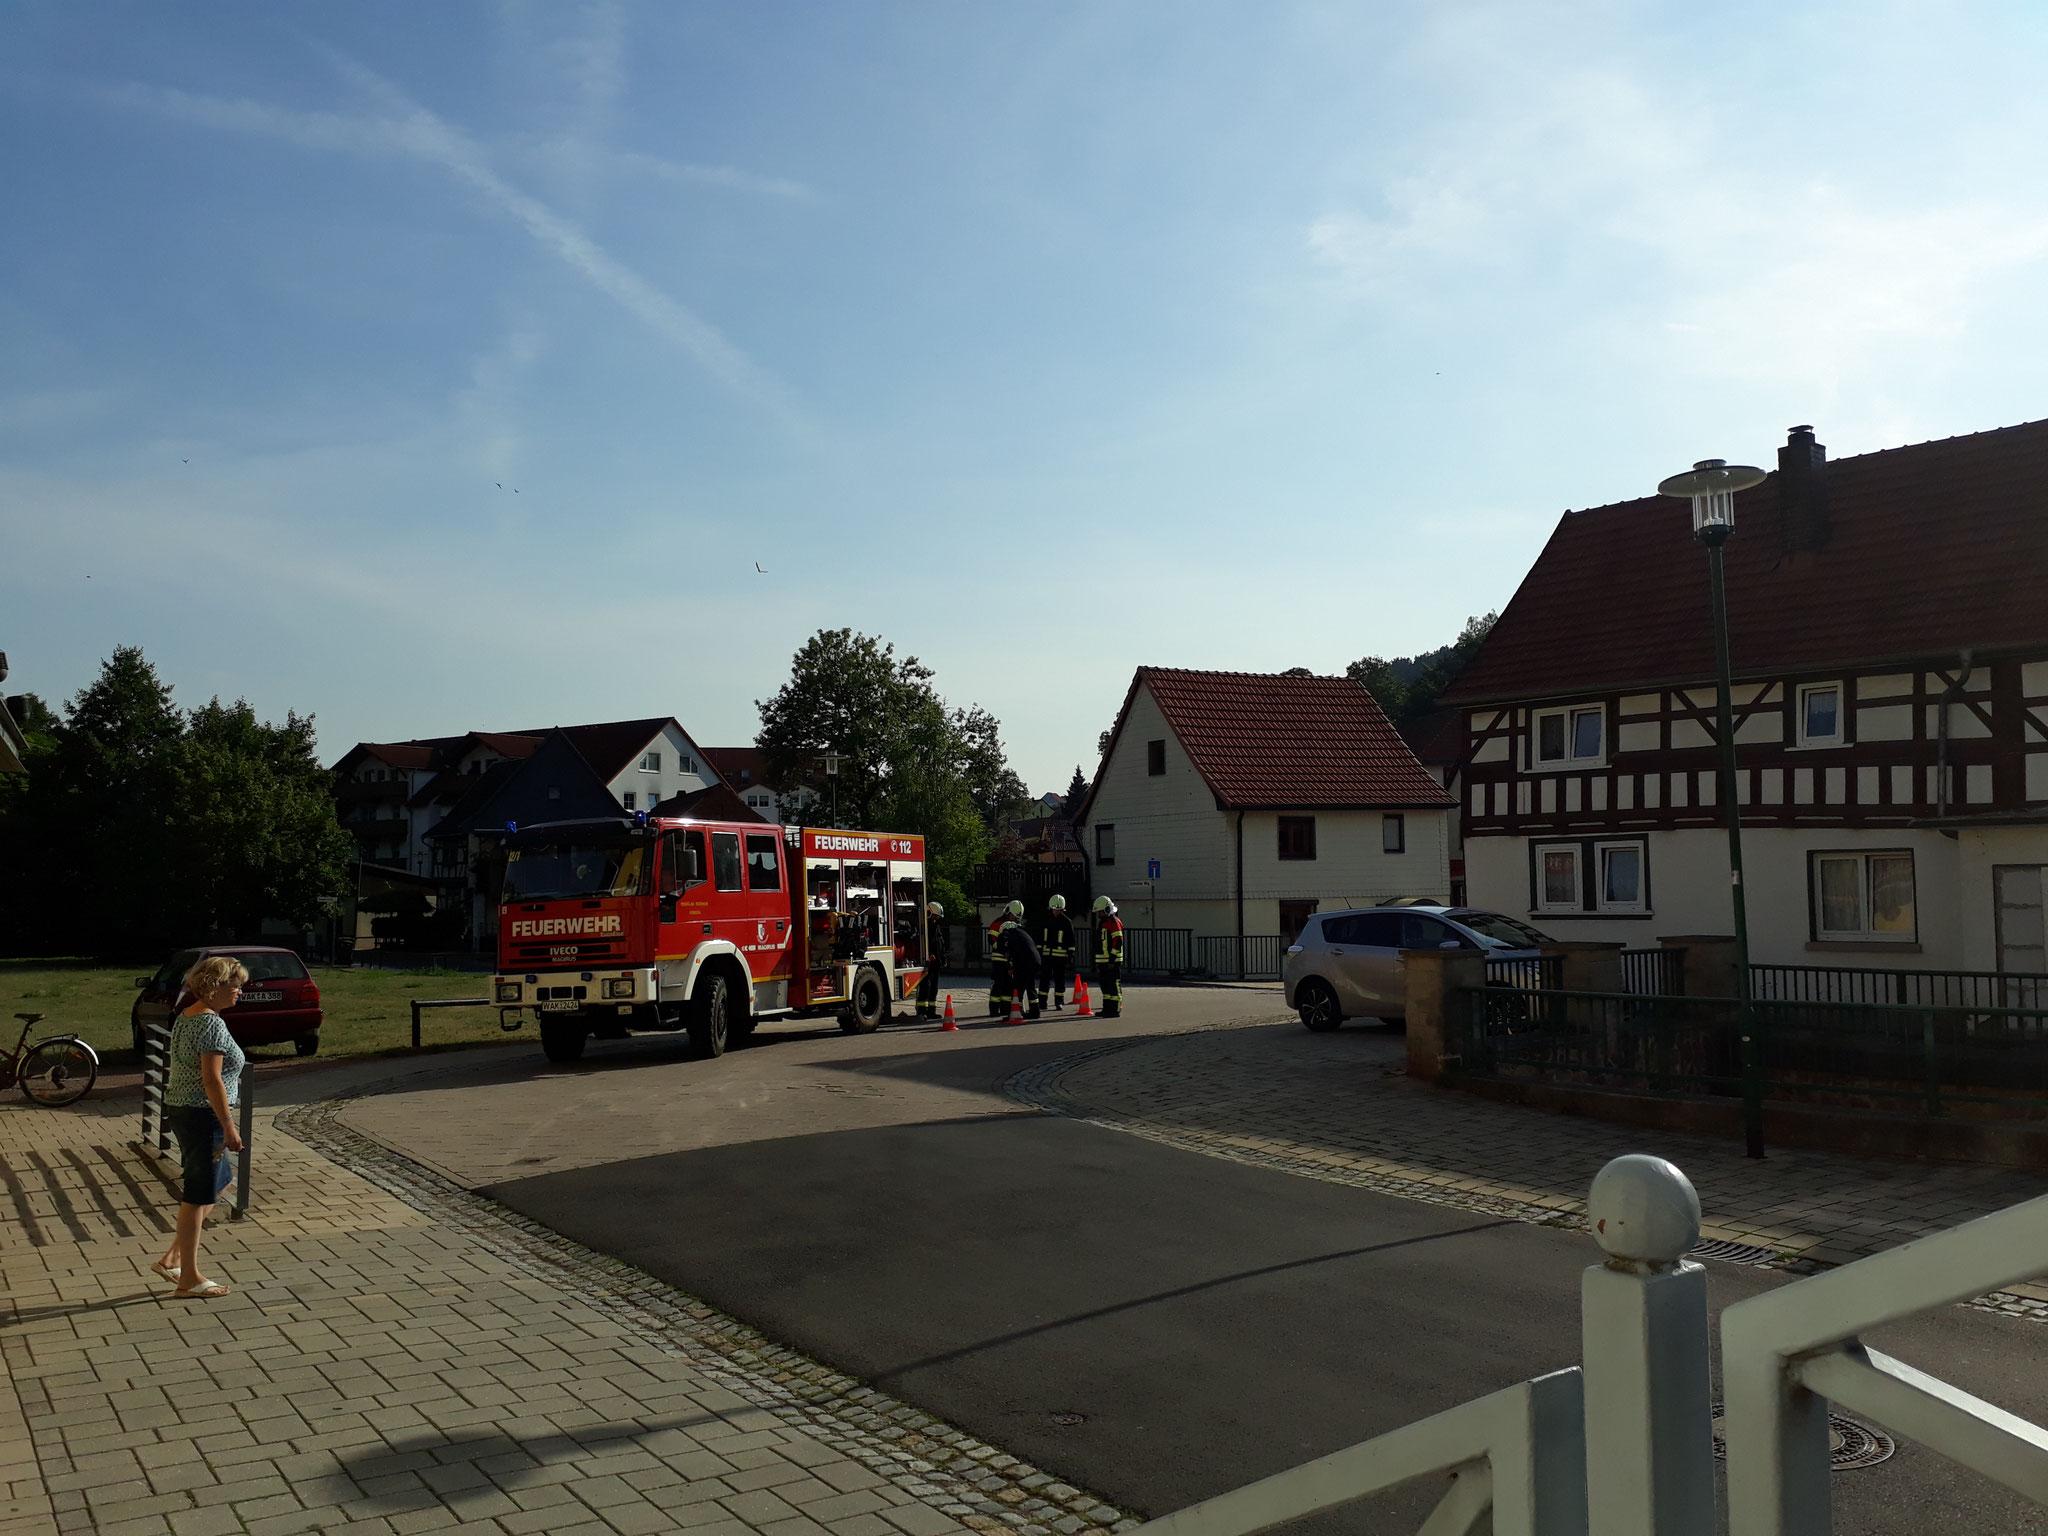 20.07.2018 Brandschutzübung - B. Anzius Kindergarten Farnroda